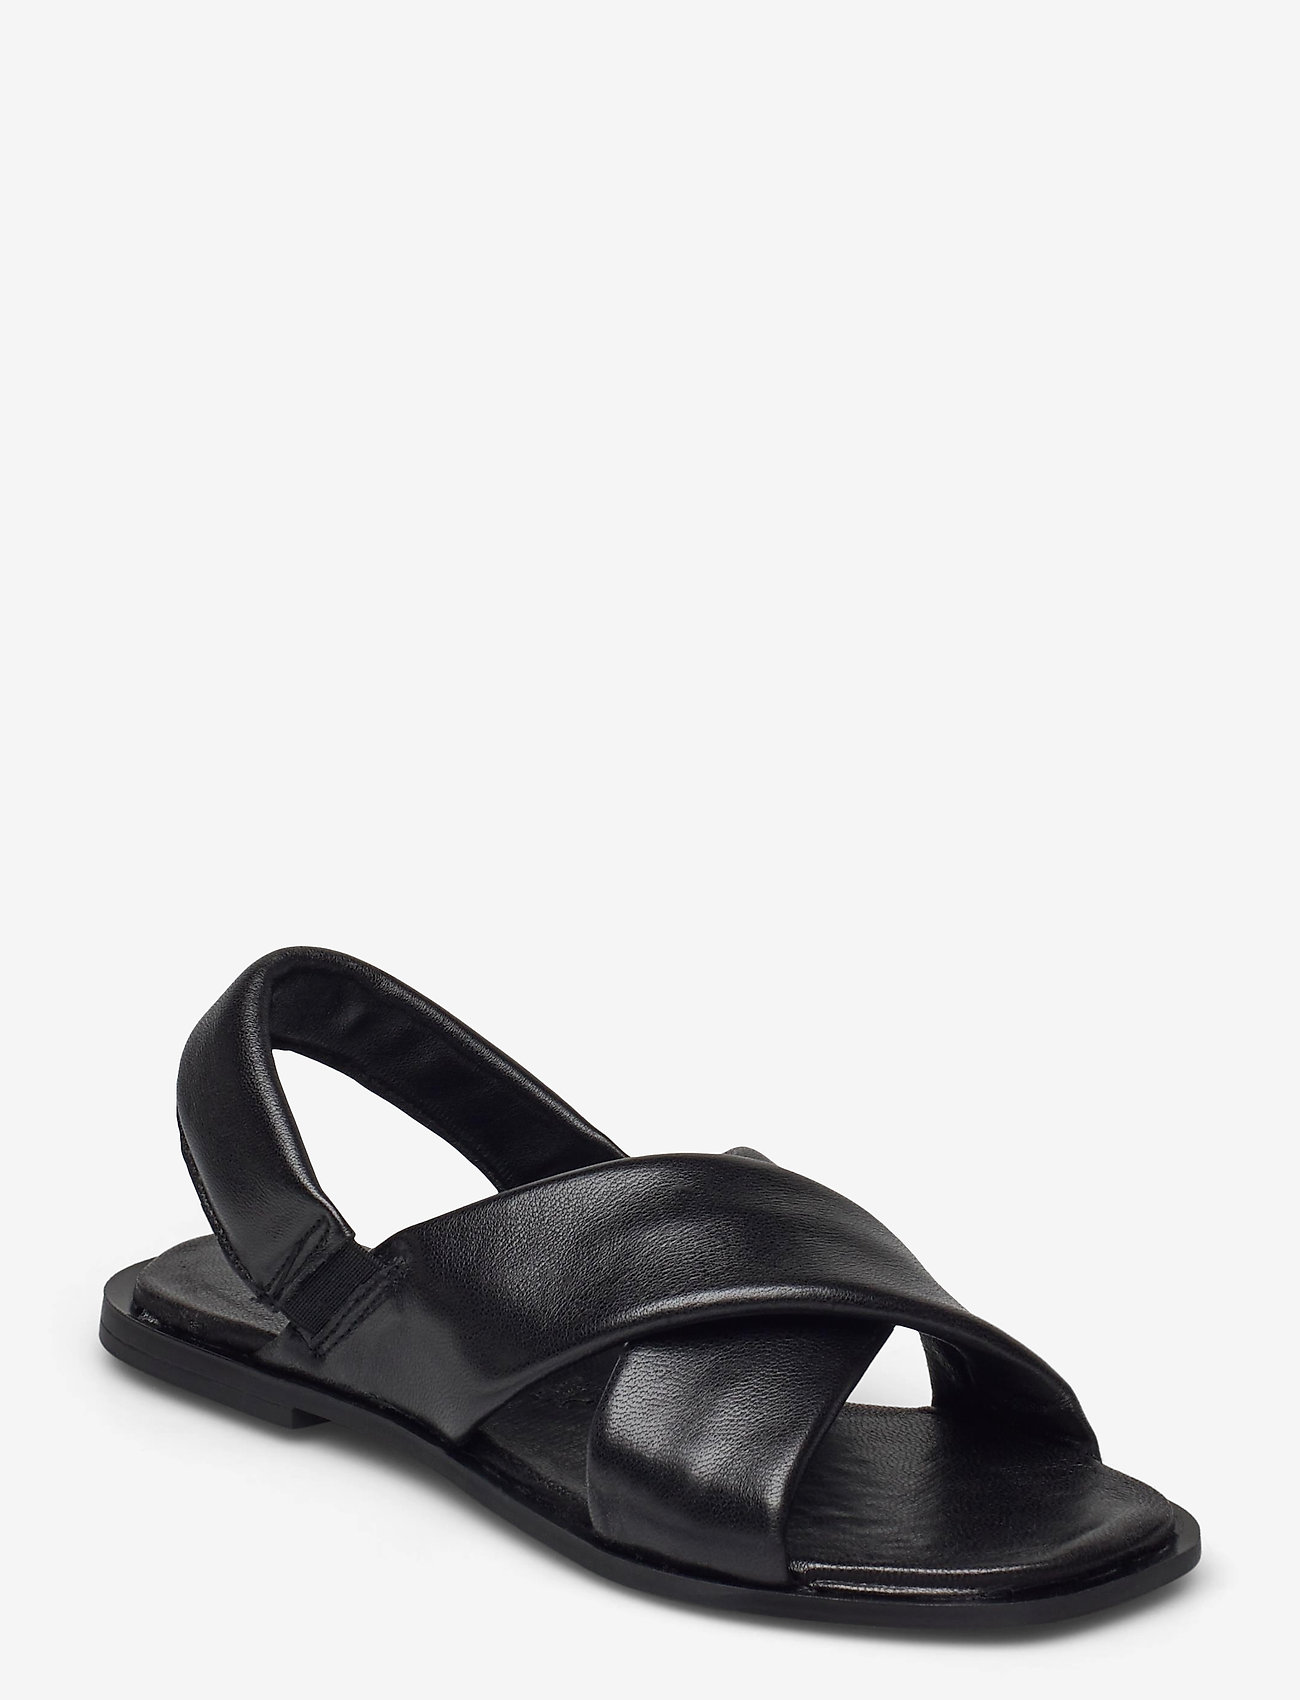 Tamaris - Woms Sandals - sandales - black leather - 0